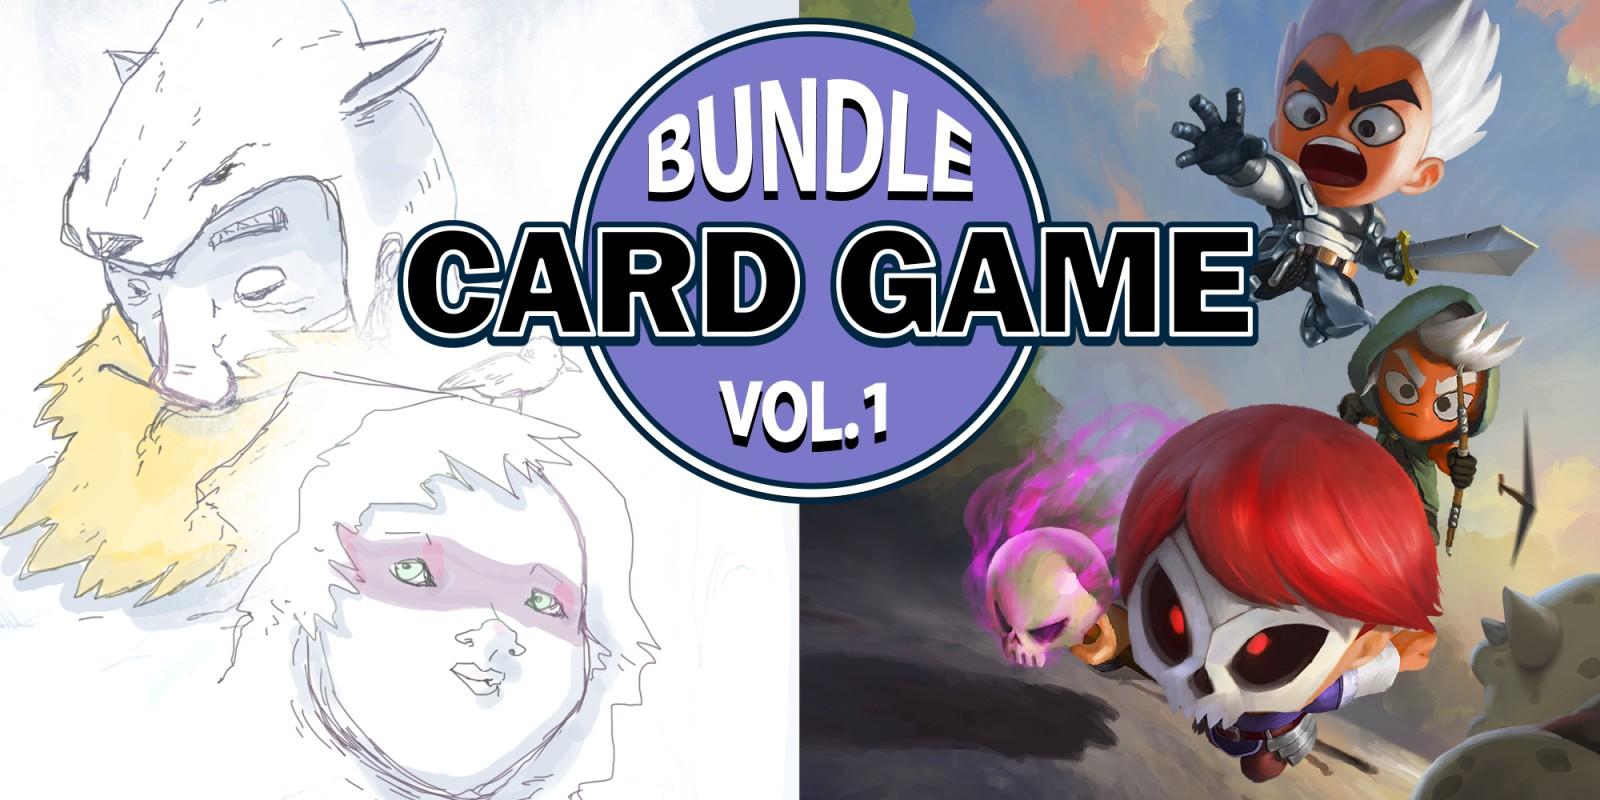 Card Game Bundle Vol. 1